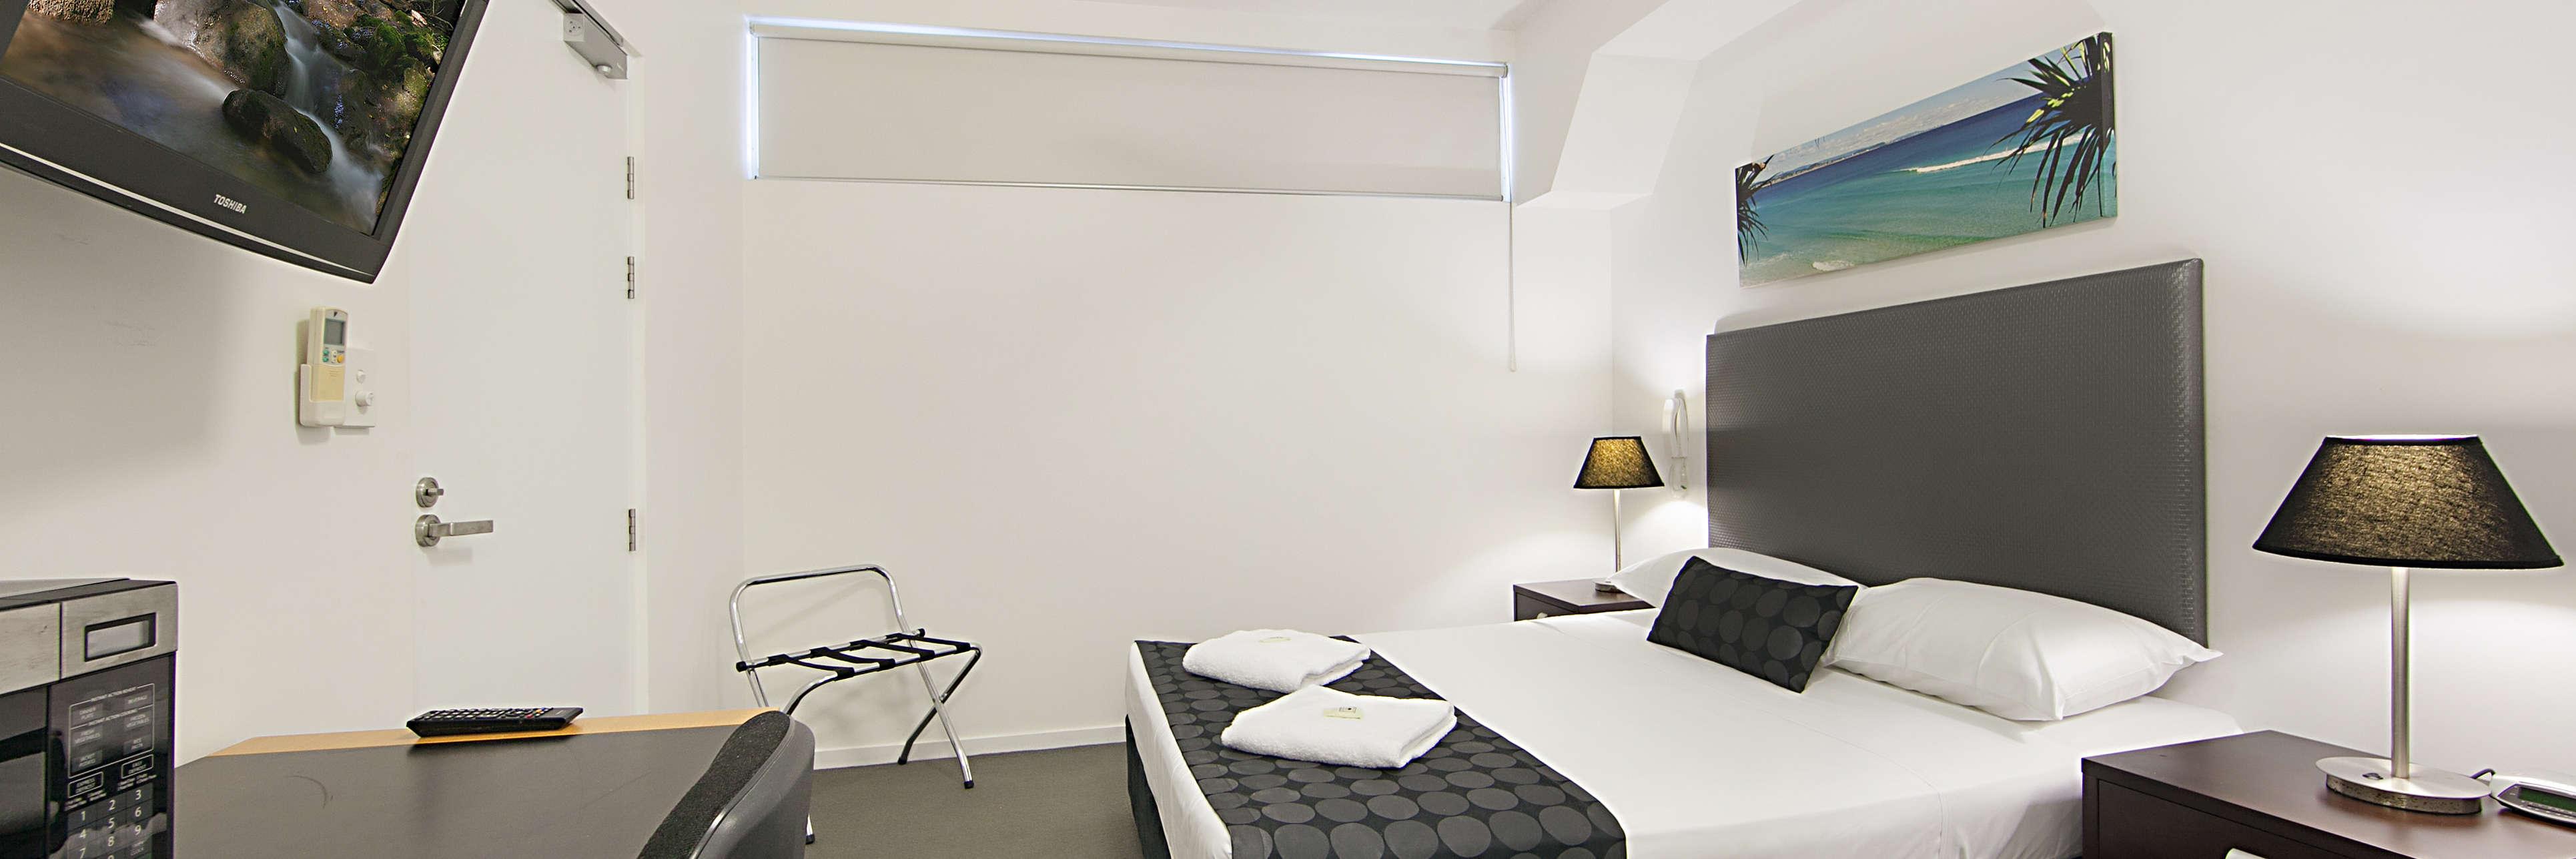 Central Holborn Apartments 76 - Studio Apartment